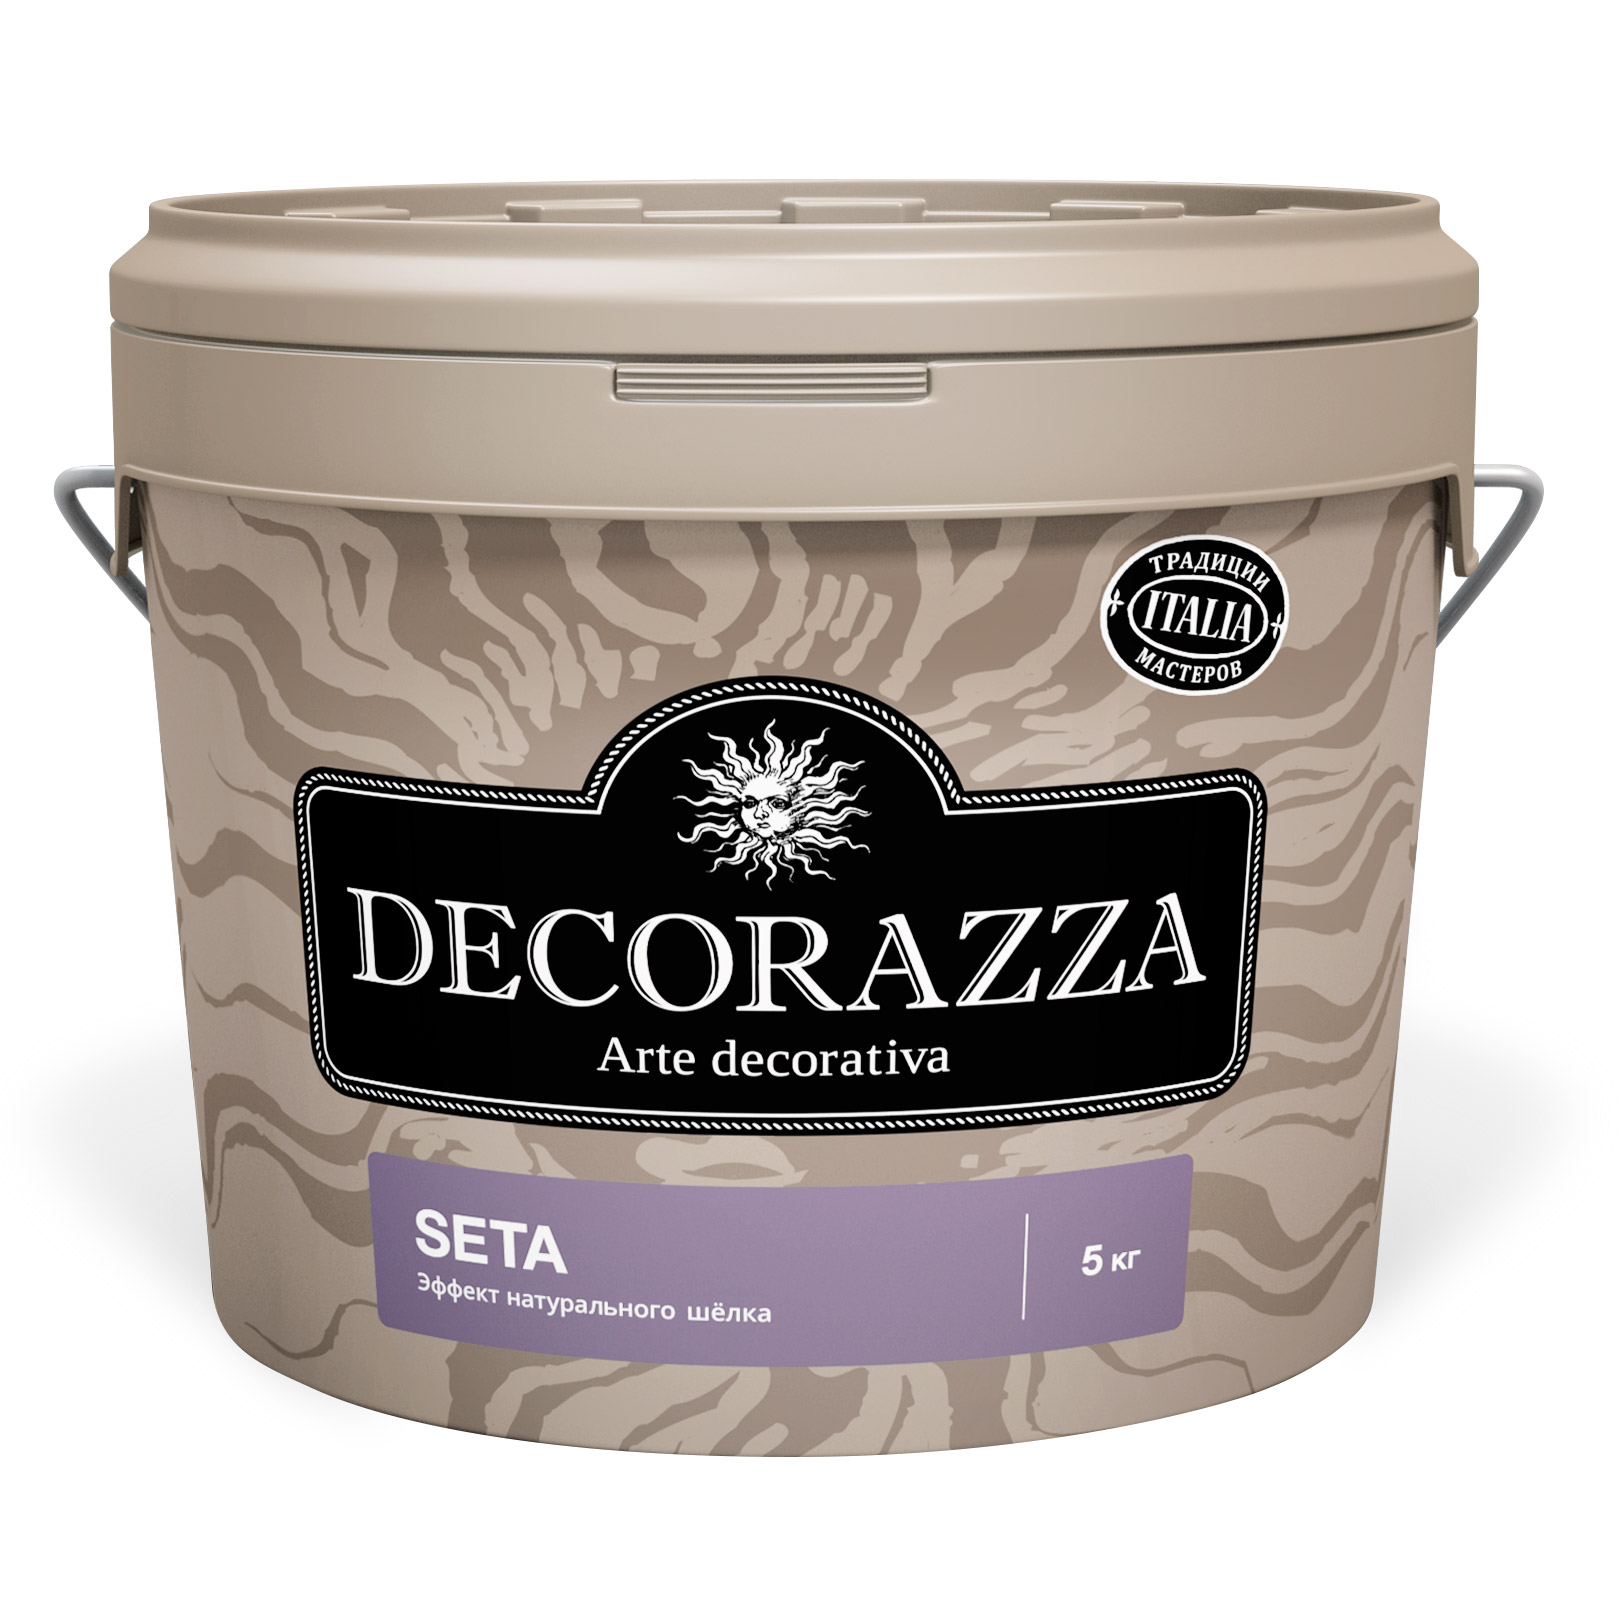 Краска Decorazza Seta Argento база серая 5 кг (DST001-5)